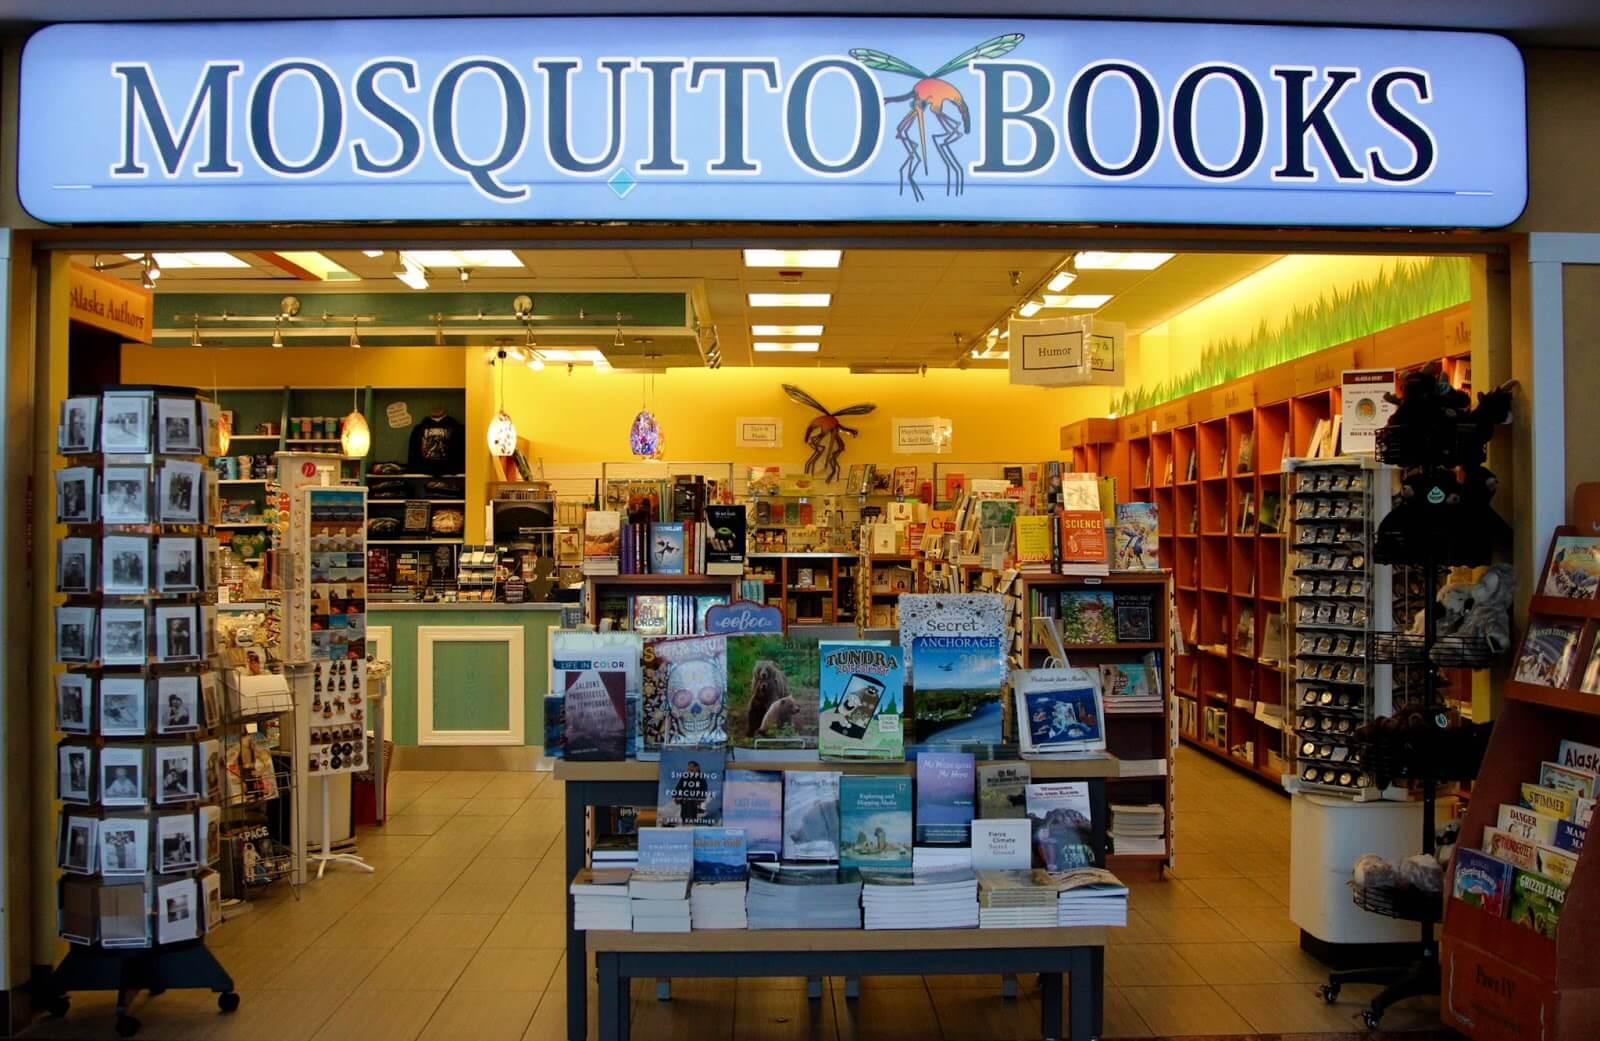 Mosquito Books